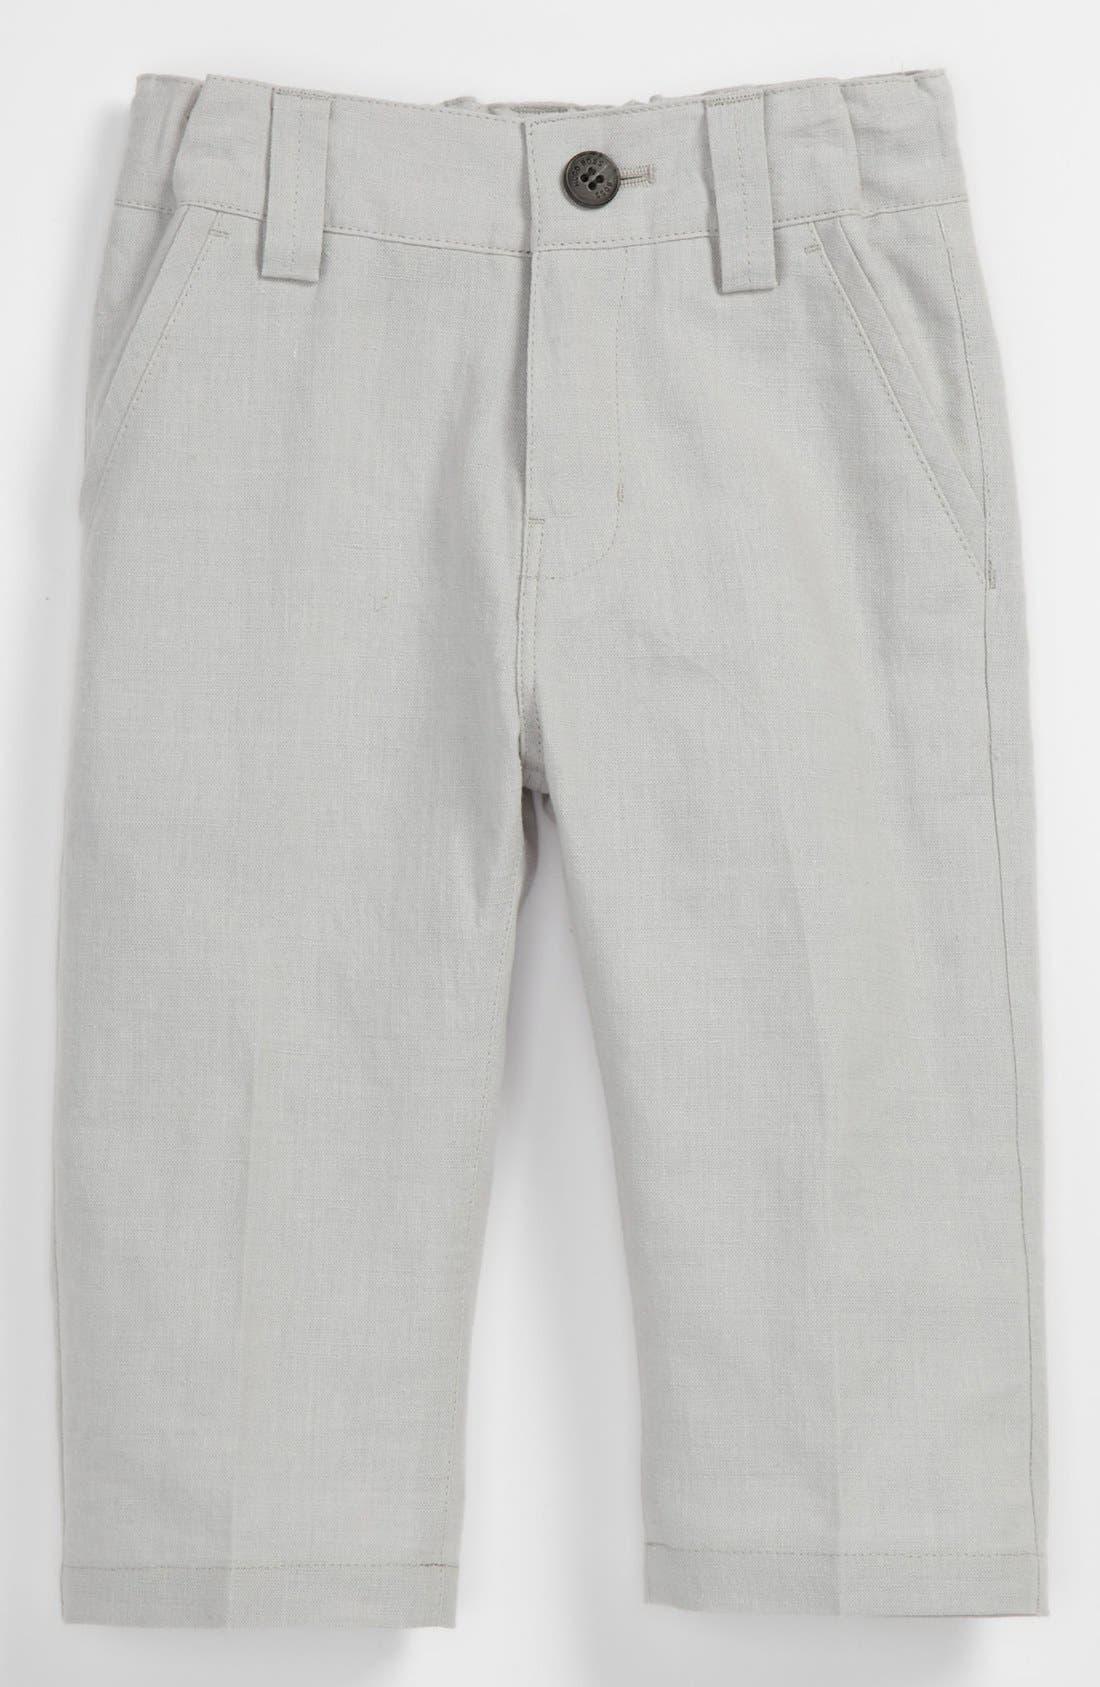 Alternate Image 1 Selected - BOSS Kidswear Linen Blend Pants (Toddler)